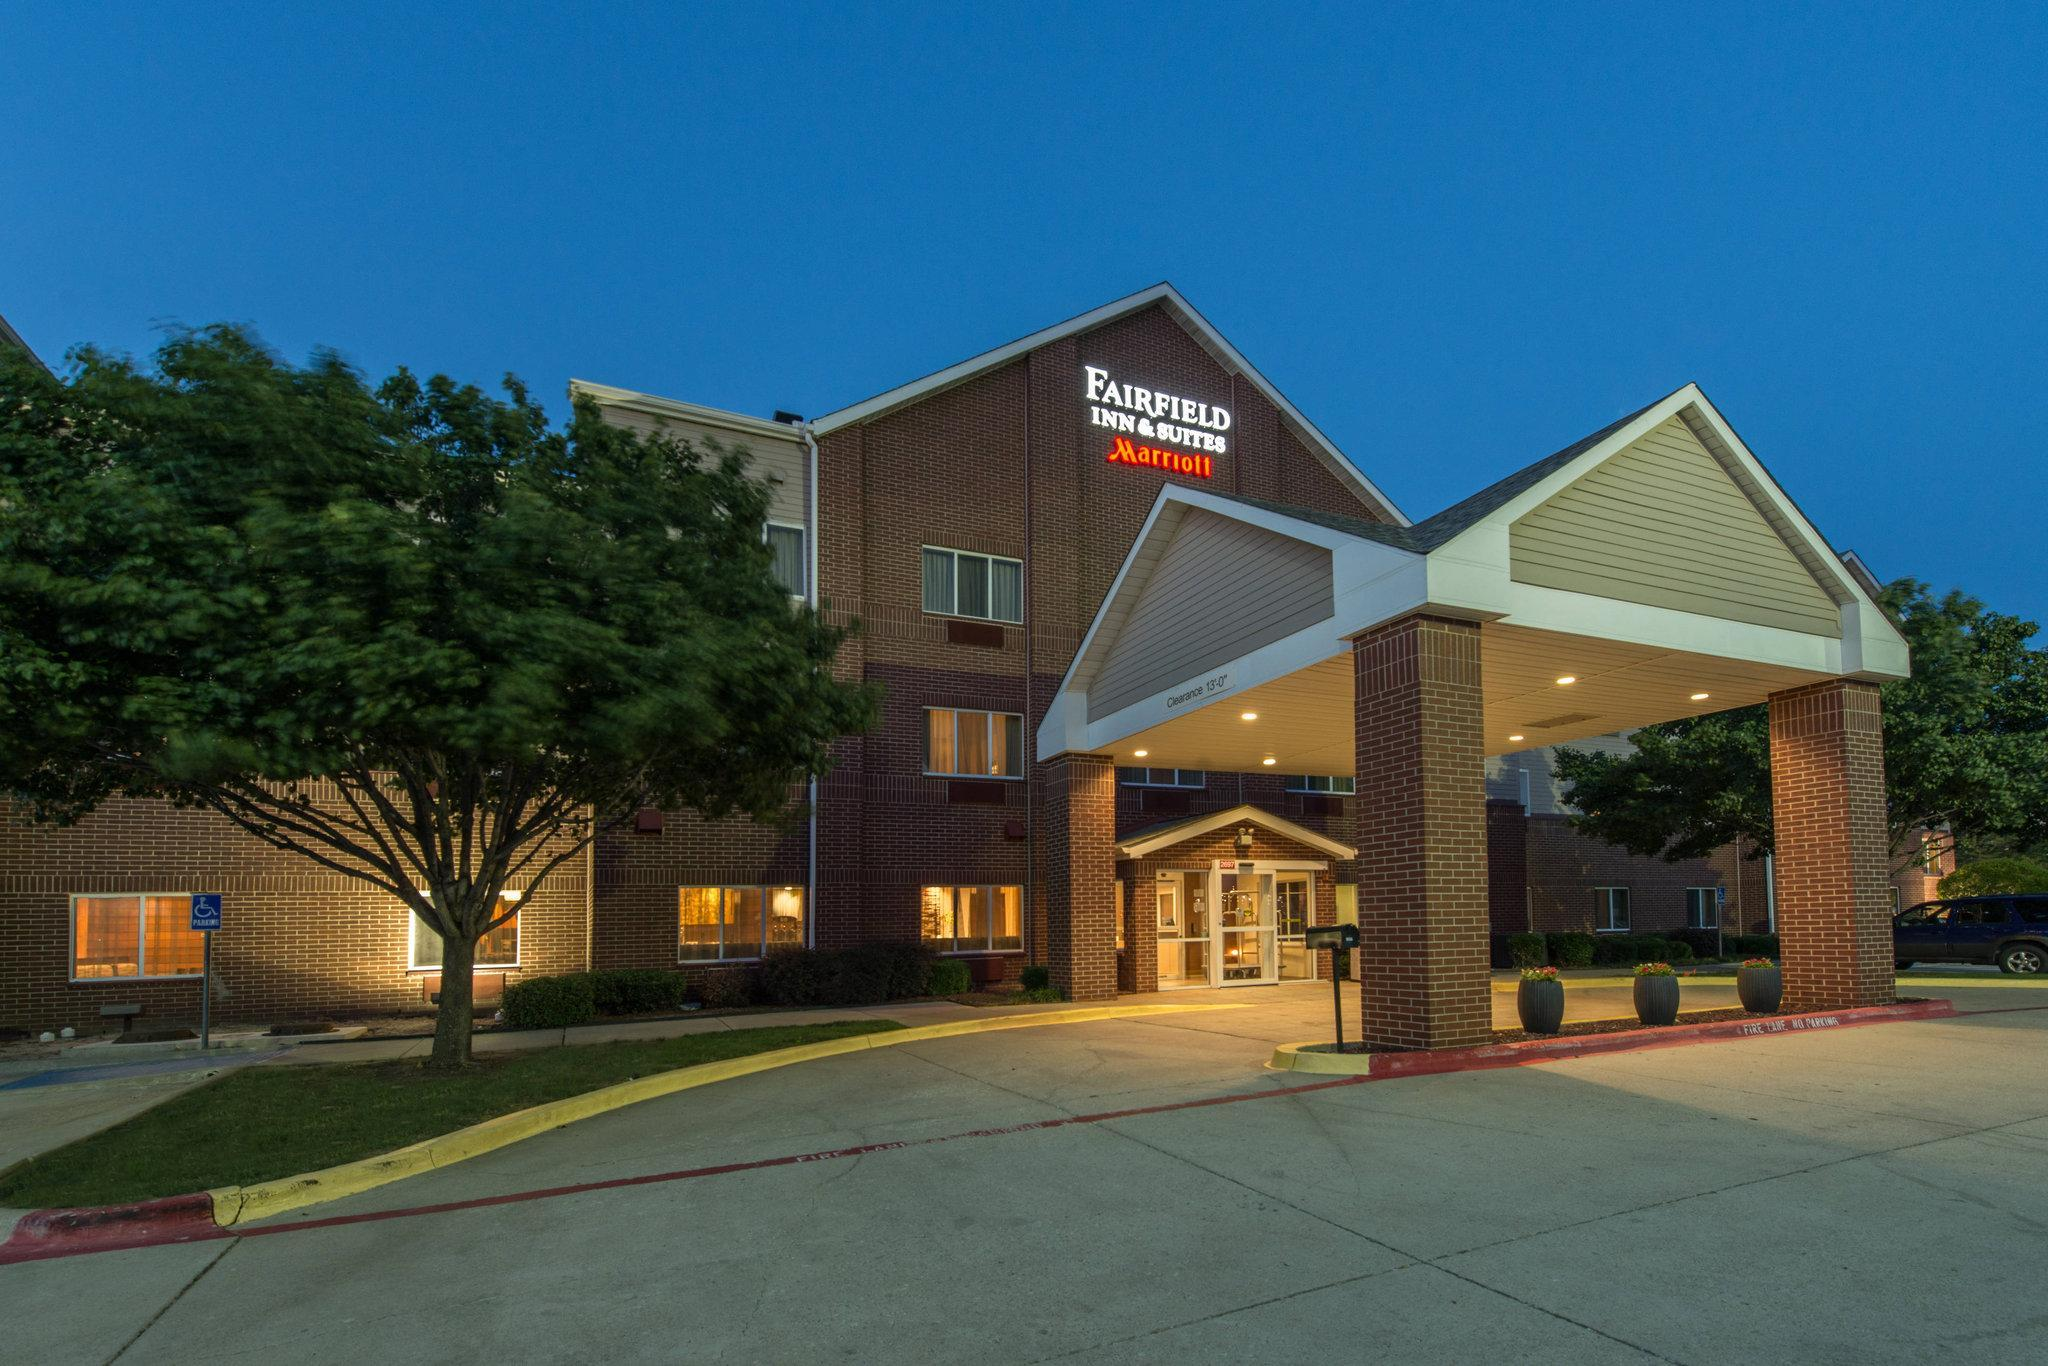 Fairfield Inn And Suites Dallas Lewisville